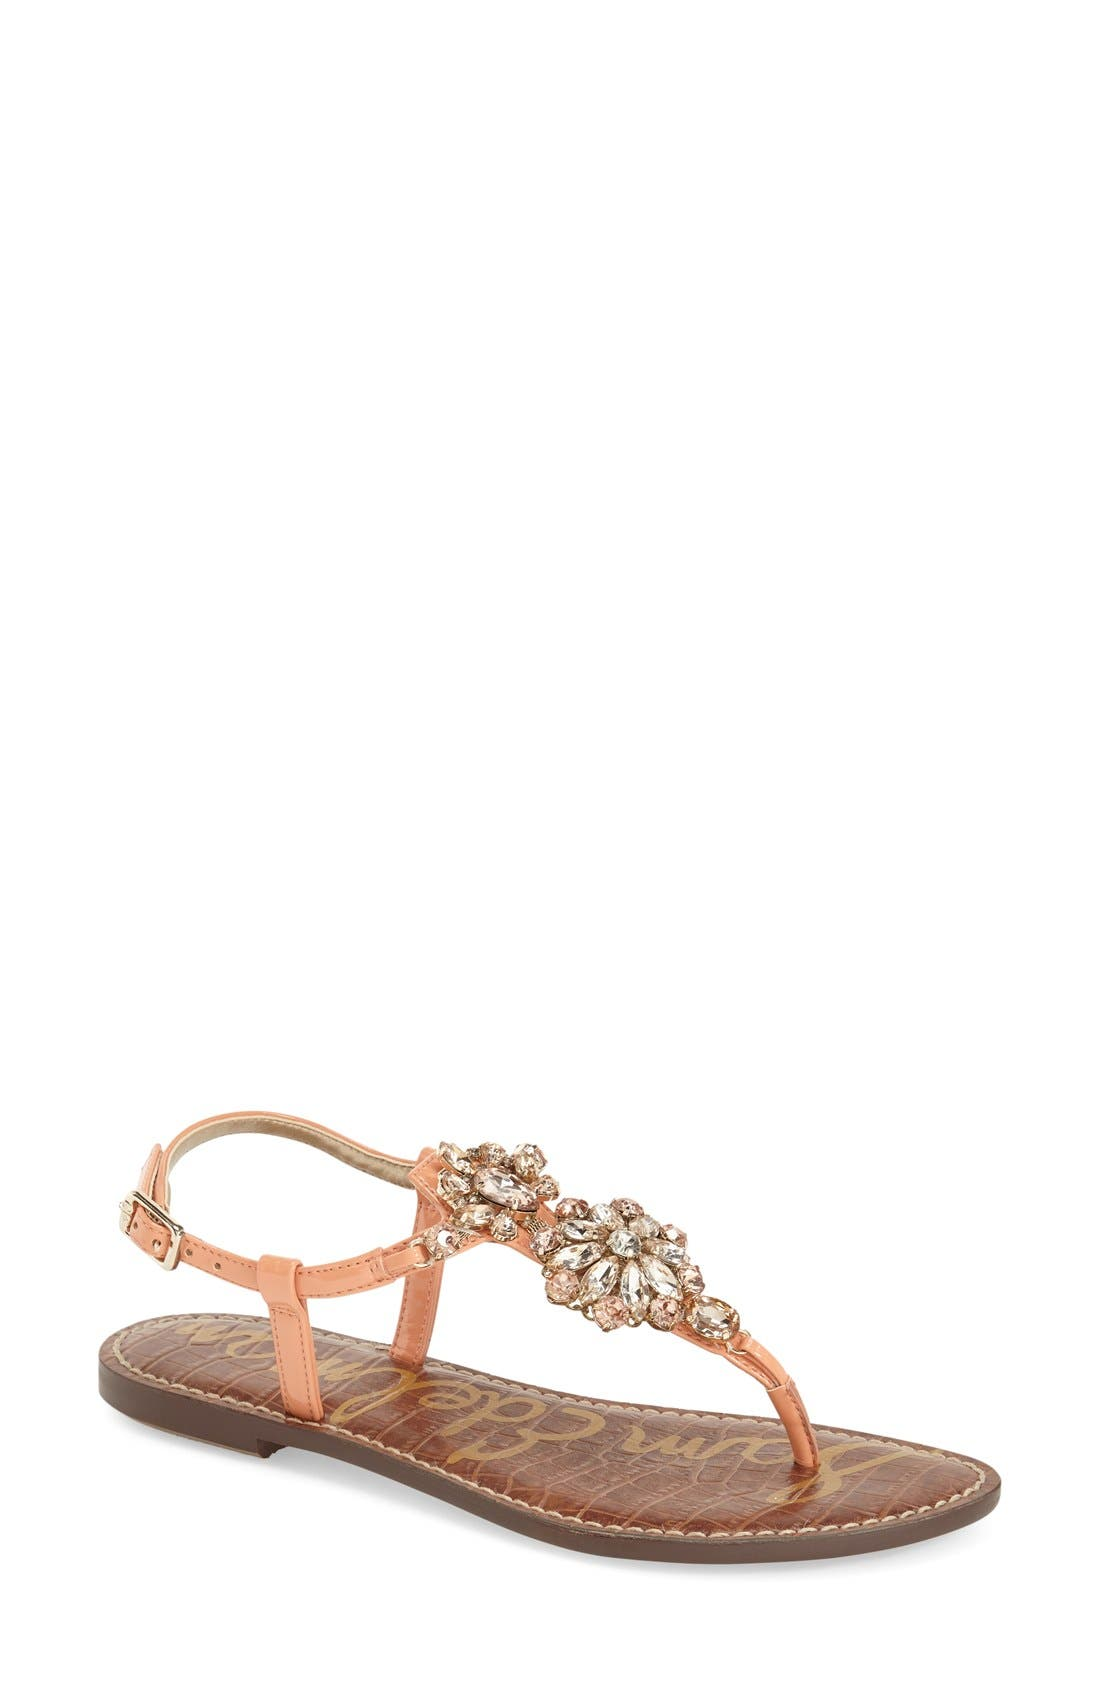 Main Image - Sam Edelman 'Grayson' Crystal Flower Flat Sandal (Women)